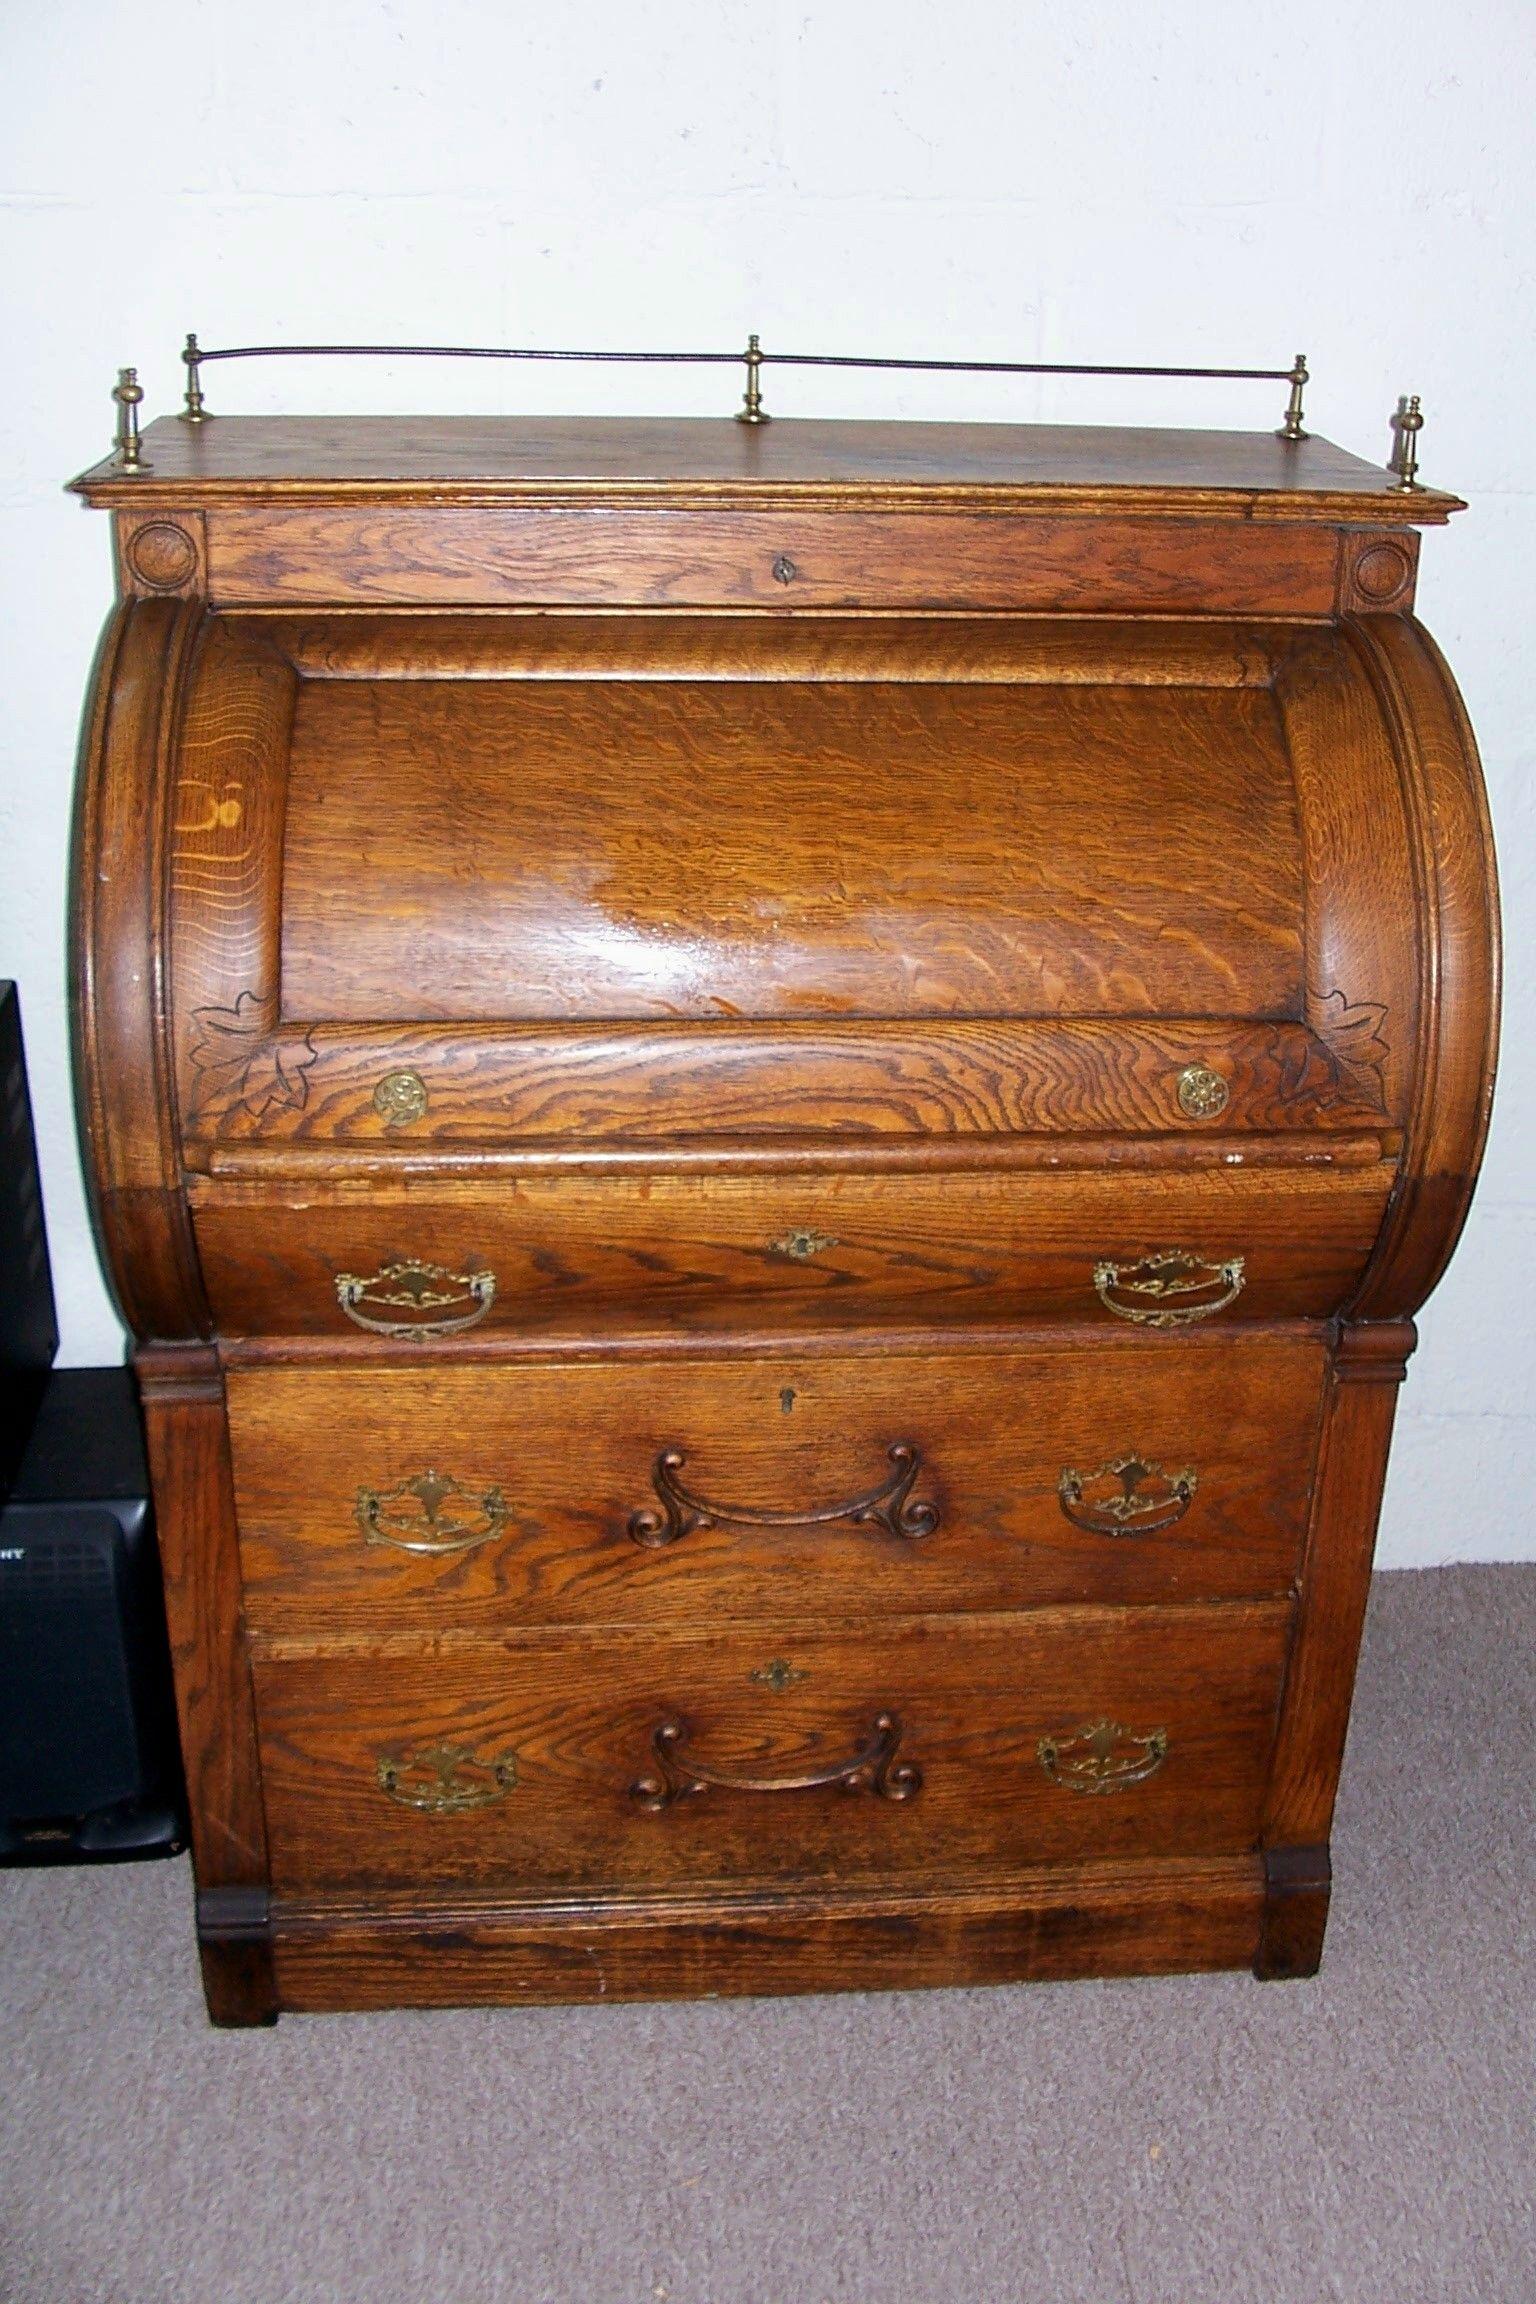 Antique roll top desk - Antique Roll Top Desk Roll Top Desk/Antique Desk Pinterest